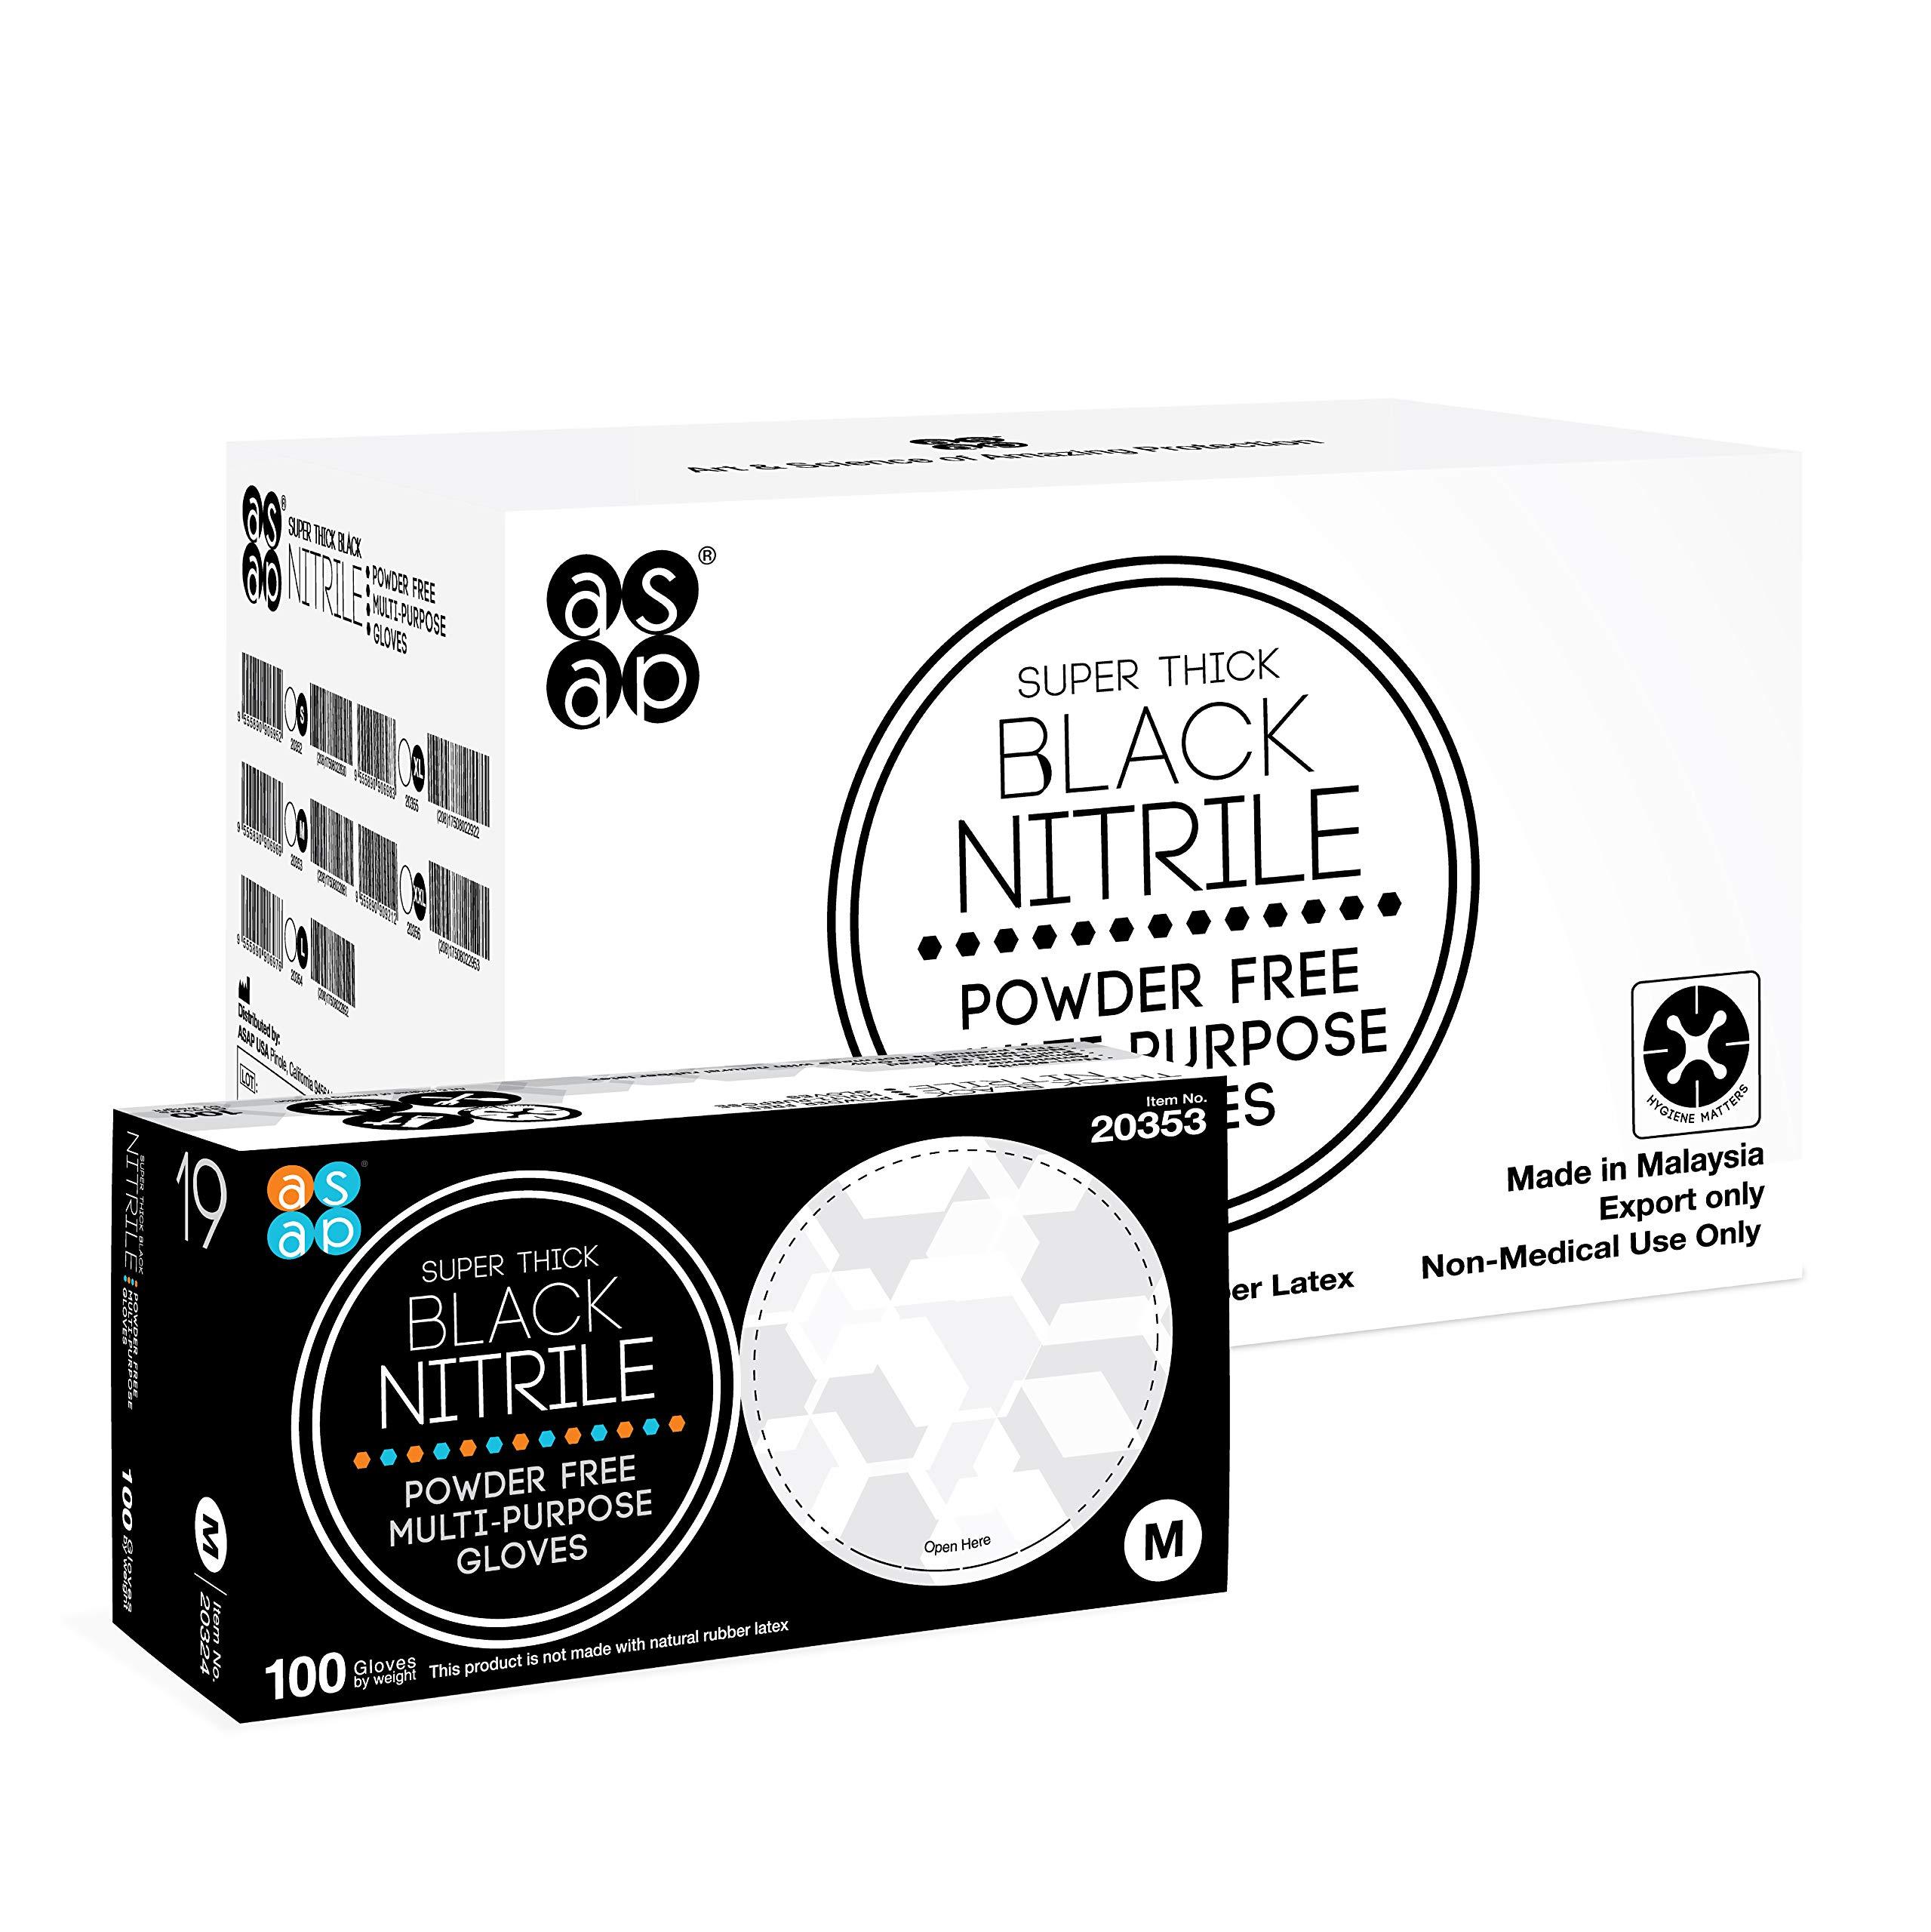 ASAP Black Nitrile Powder Free Multi-Purpose Gloves, Disposable, 5.5 mil, Black (X-Large - Case of 1000)